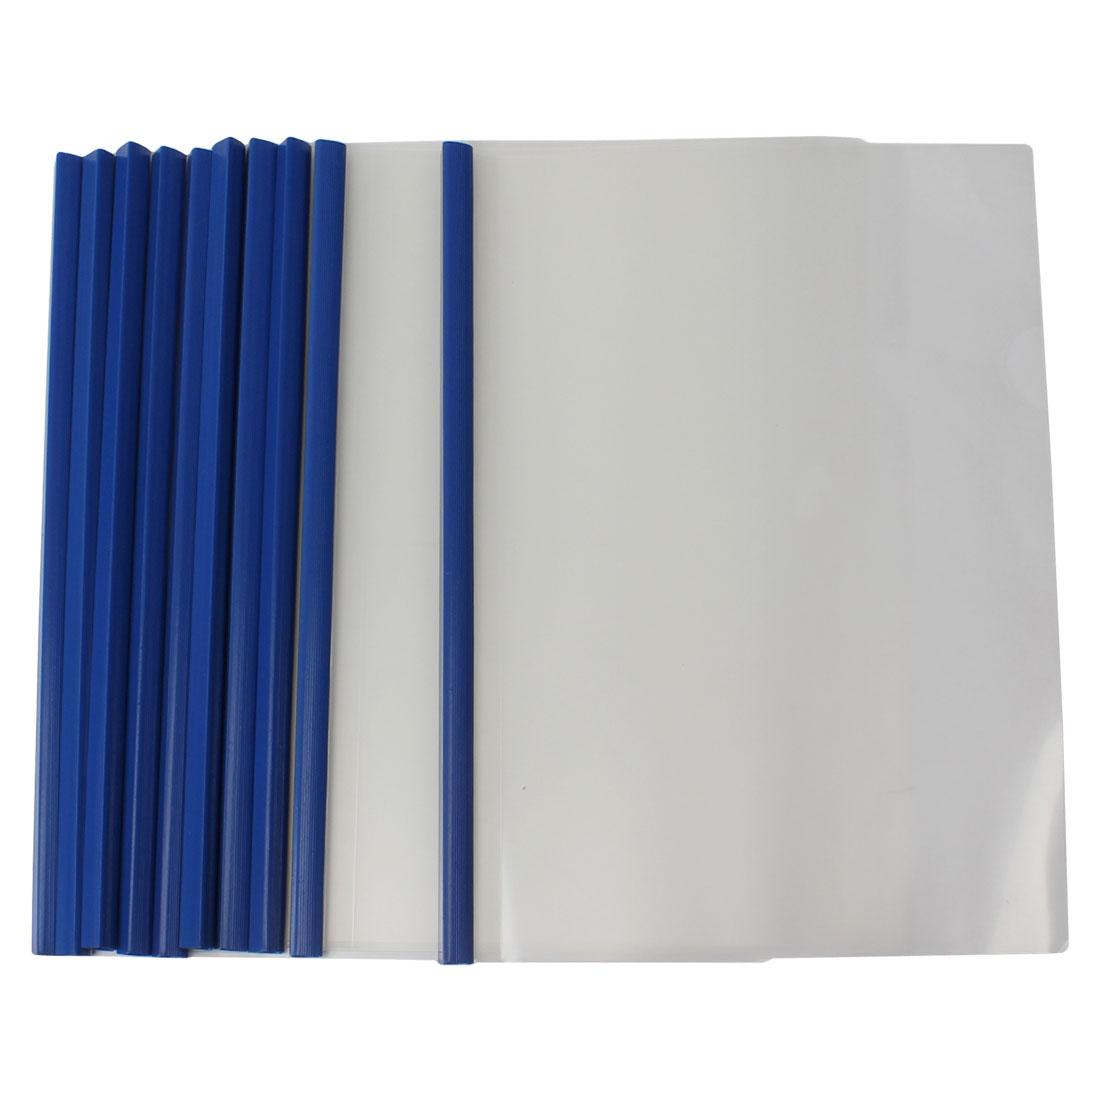 10 Pieces Plastic Clear Sliding Blue Bar File Folder for A4 Paper Report